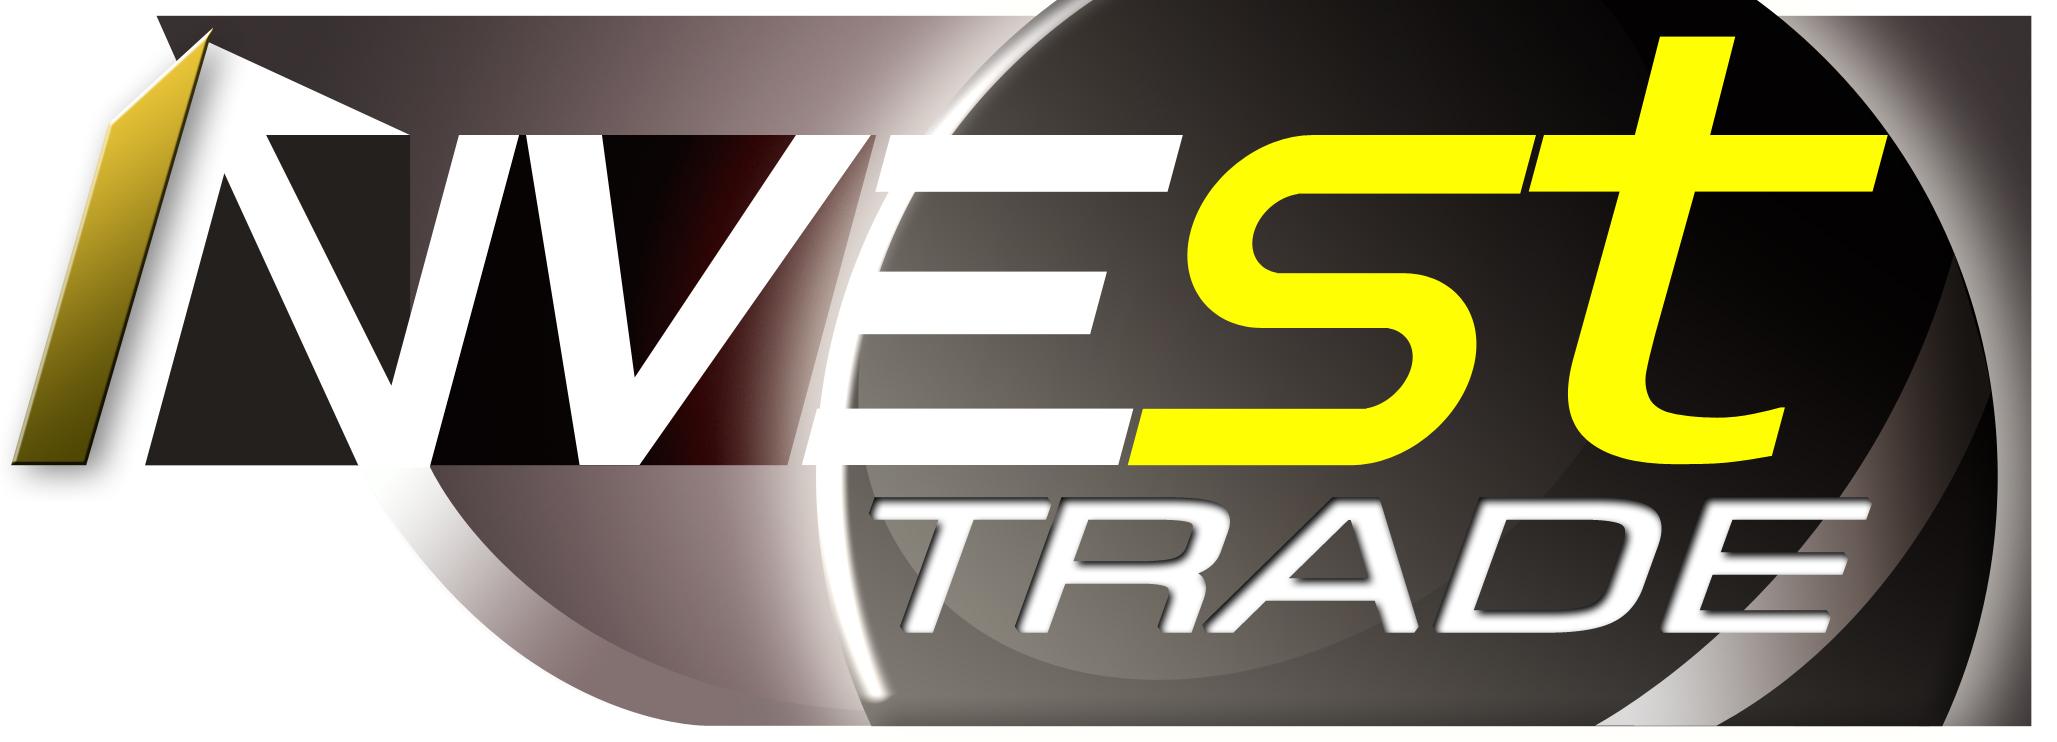 Разработка логотипа для компании Invest trade фото f_0455128d8ba093c2.jpg